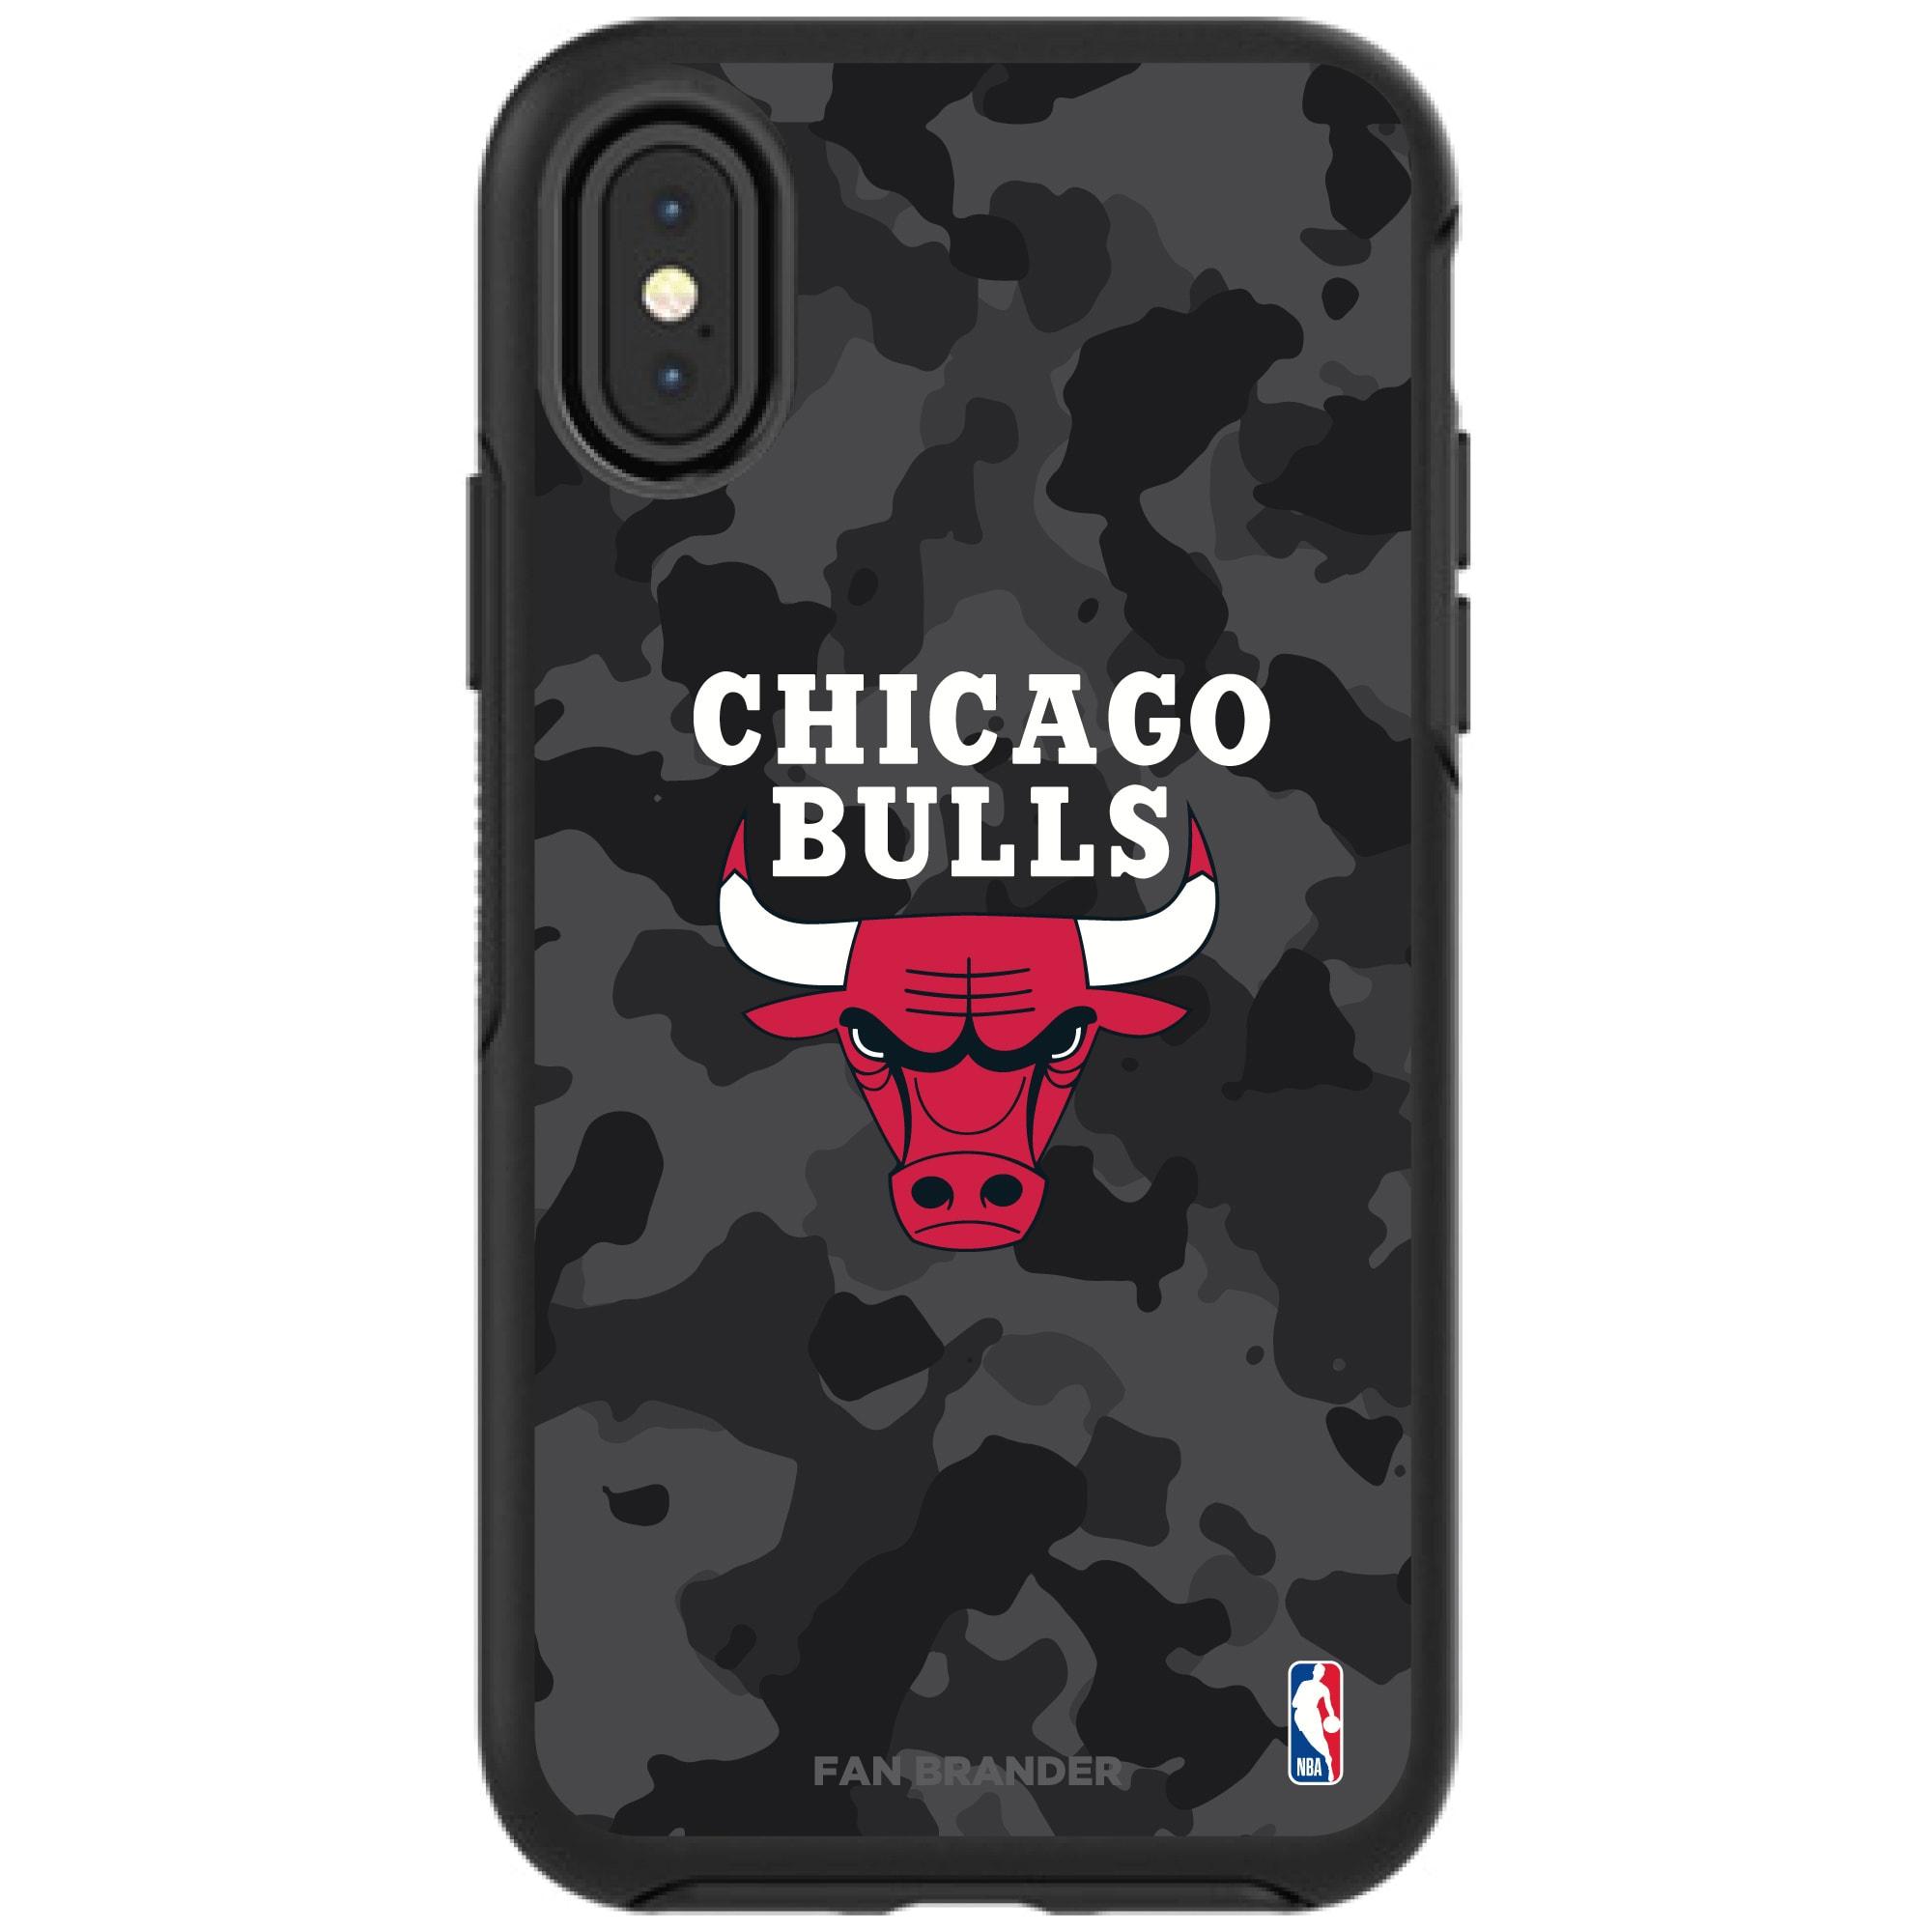 Chicago Bulls OtterBox Urban Camo iPhone Case